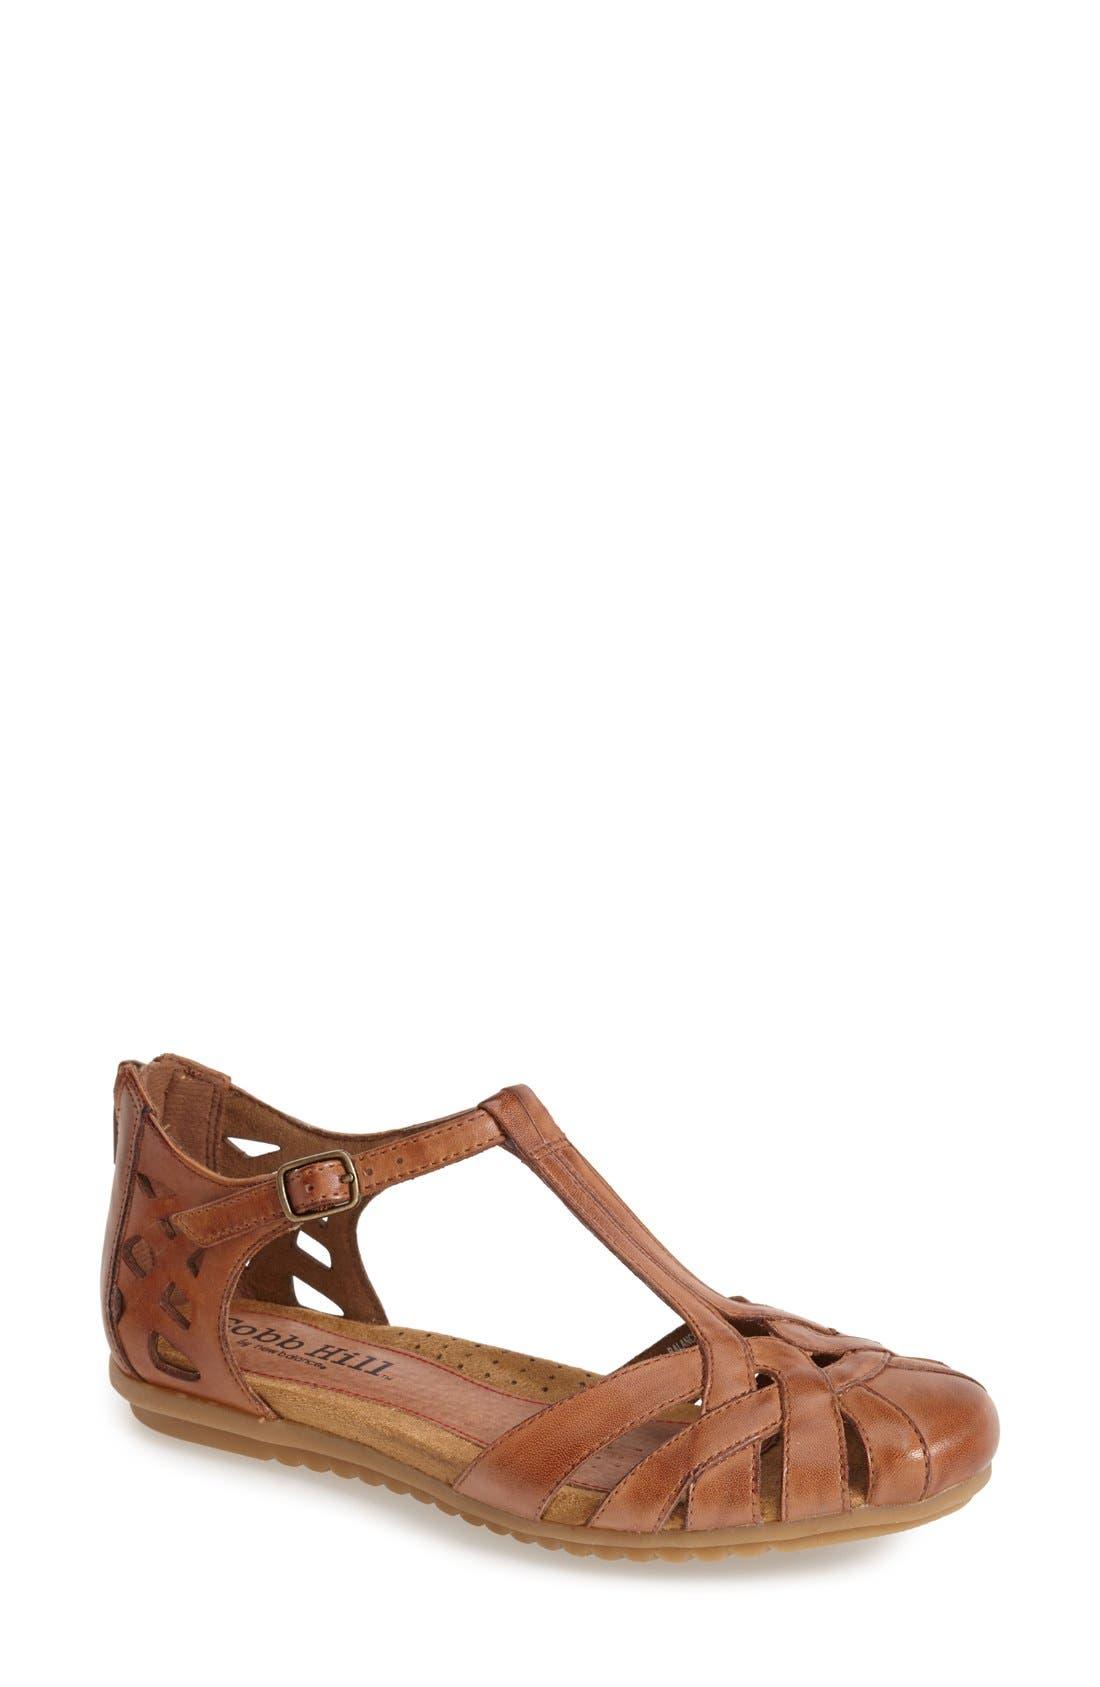 'Ireland' Leather Sandal,                         Main,                         color, TAN